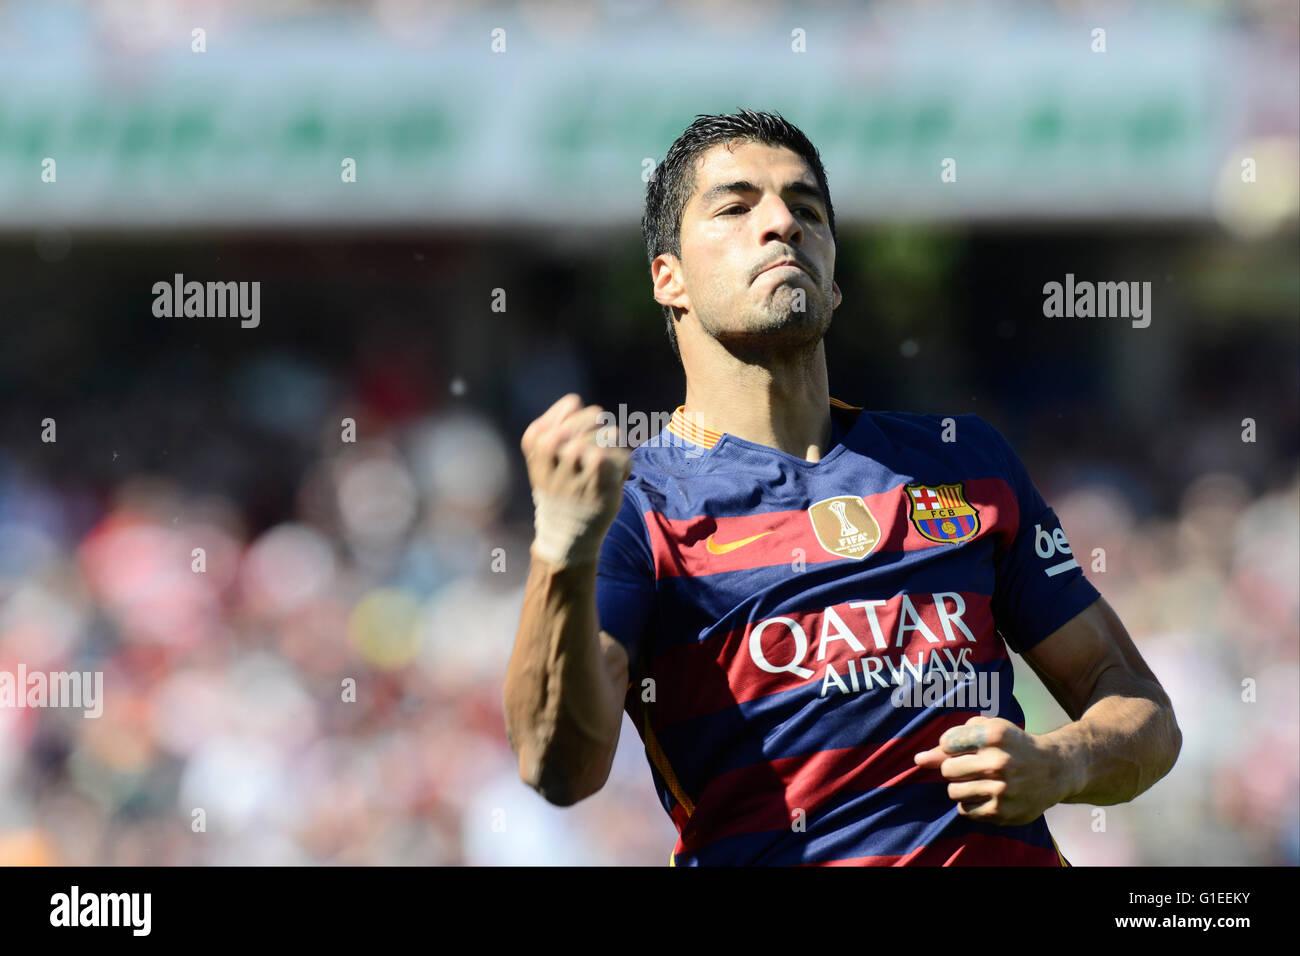 0a23971ff92 Granada, Spain. 14th May, 2016. Luis Suarez during the last league ...